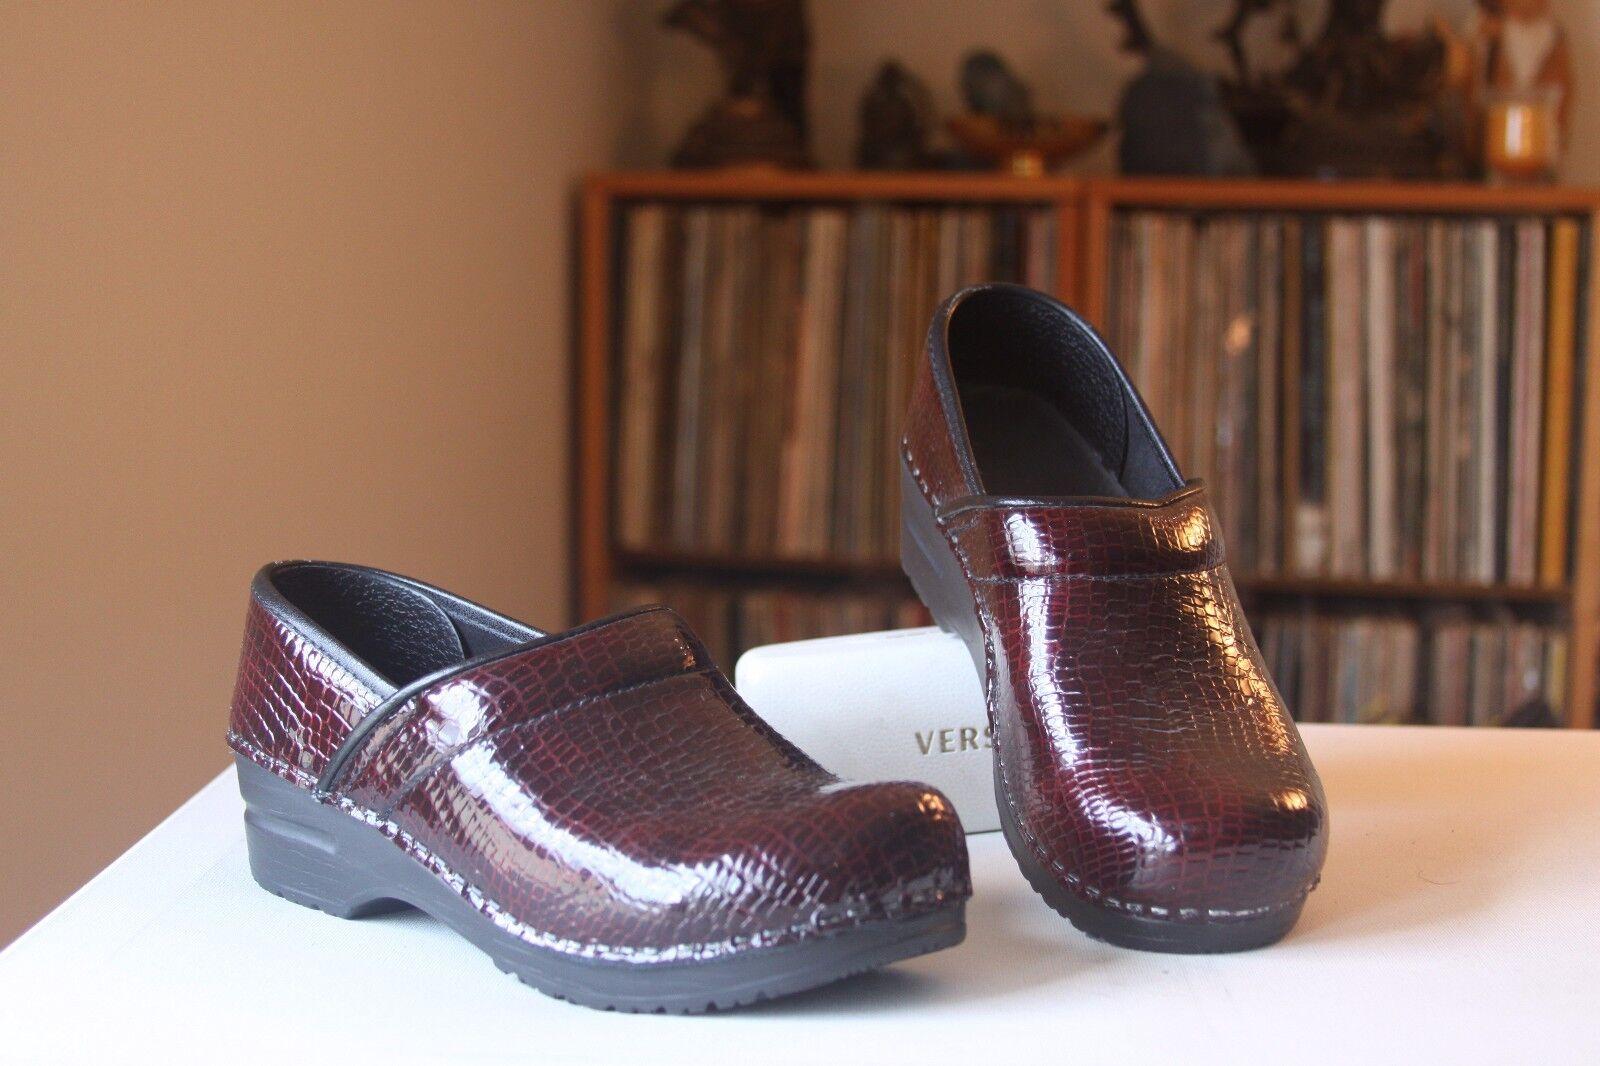 Sanita 37 Bordeaux Crocodile Embossed Pro Patent Leder Stapled Pro Embossed Clogs US 6.5-7 88cfe6